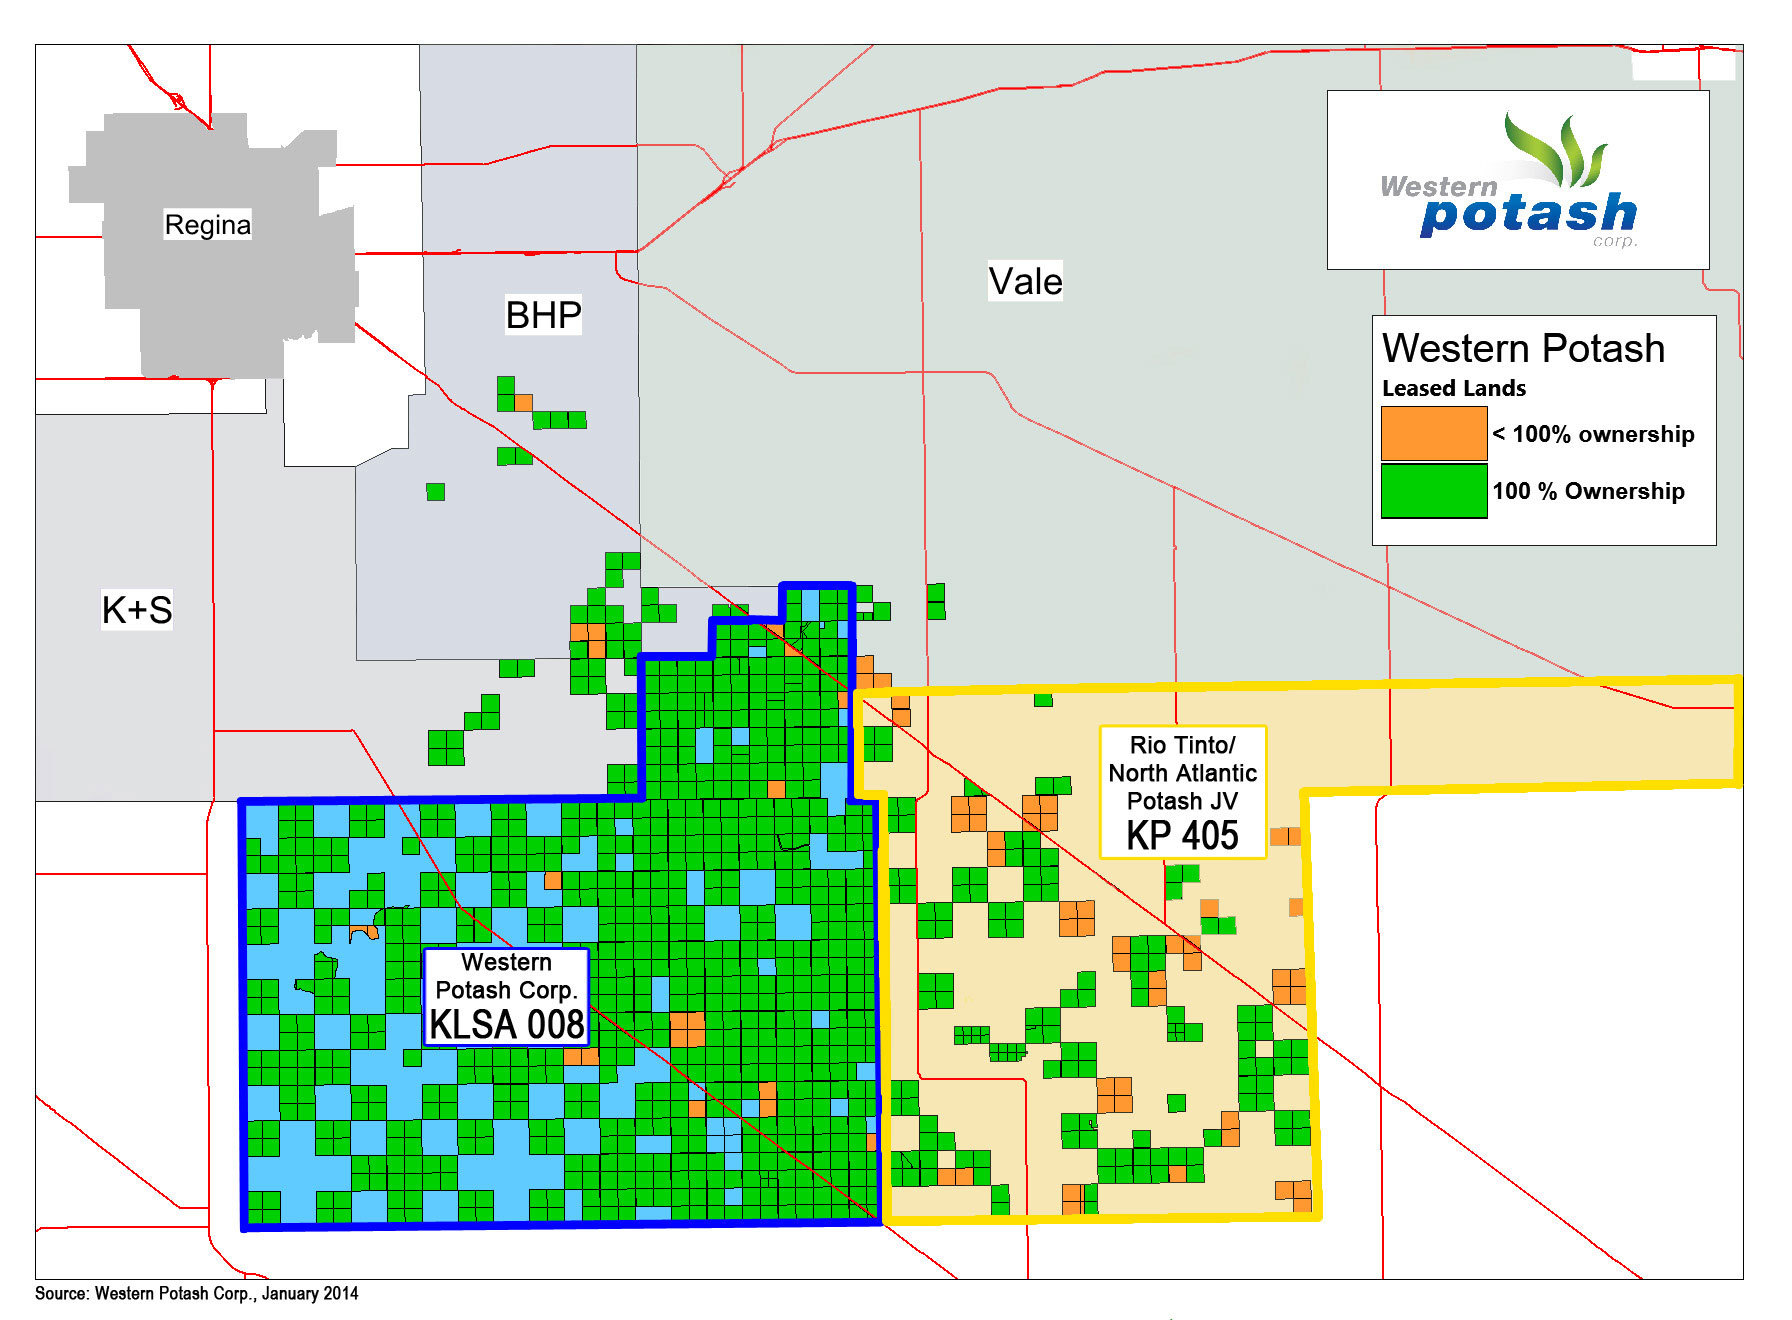 Source: Western Potash Corp., January 2014